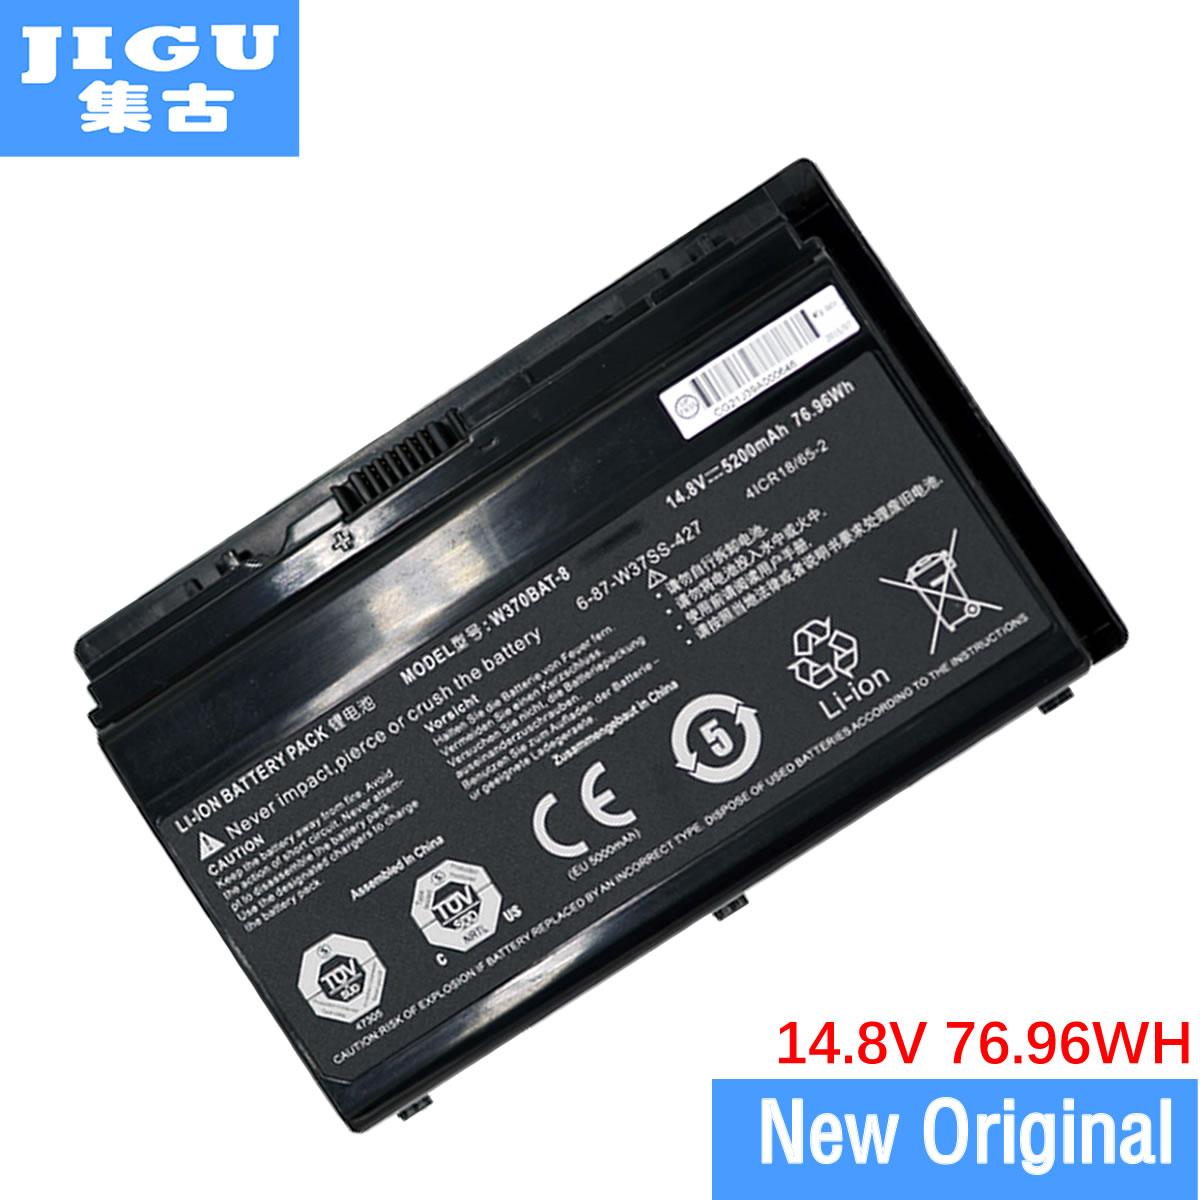 JIGU W370bat-8 Battery For Clevo W350et W350etq W370et Sager Np6350 Np6370 Xmg A522 Xmg Xmg A722 6-87-w370s-4271 original rechargeable clevo w370bat 8 li ion battery 6 87 w370s 4271 6 87 w37ss 427 k590s laptop battery 14 8v 5200mah 76 96wh